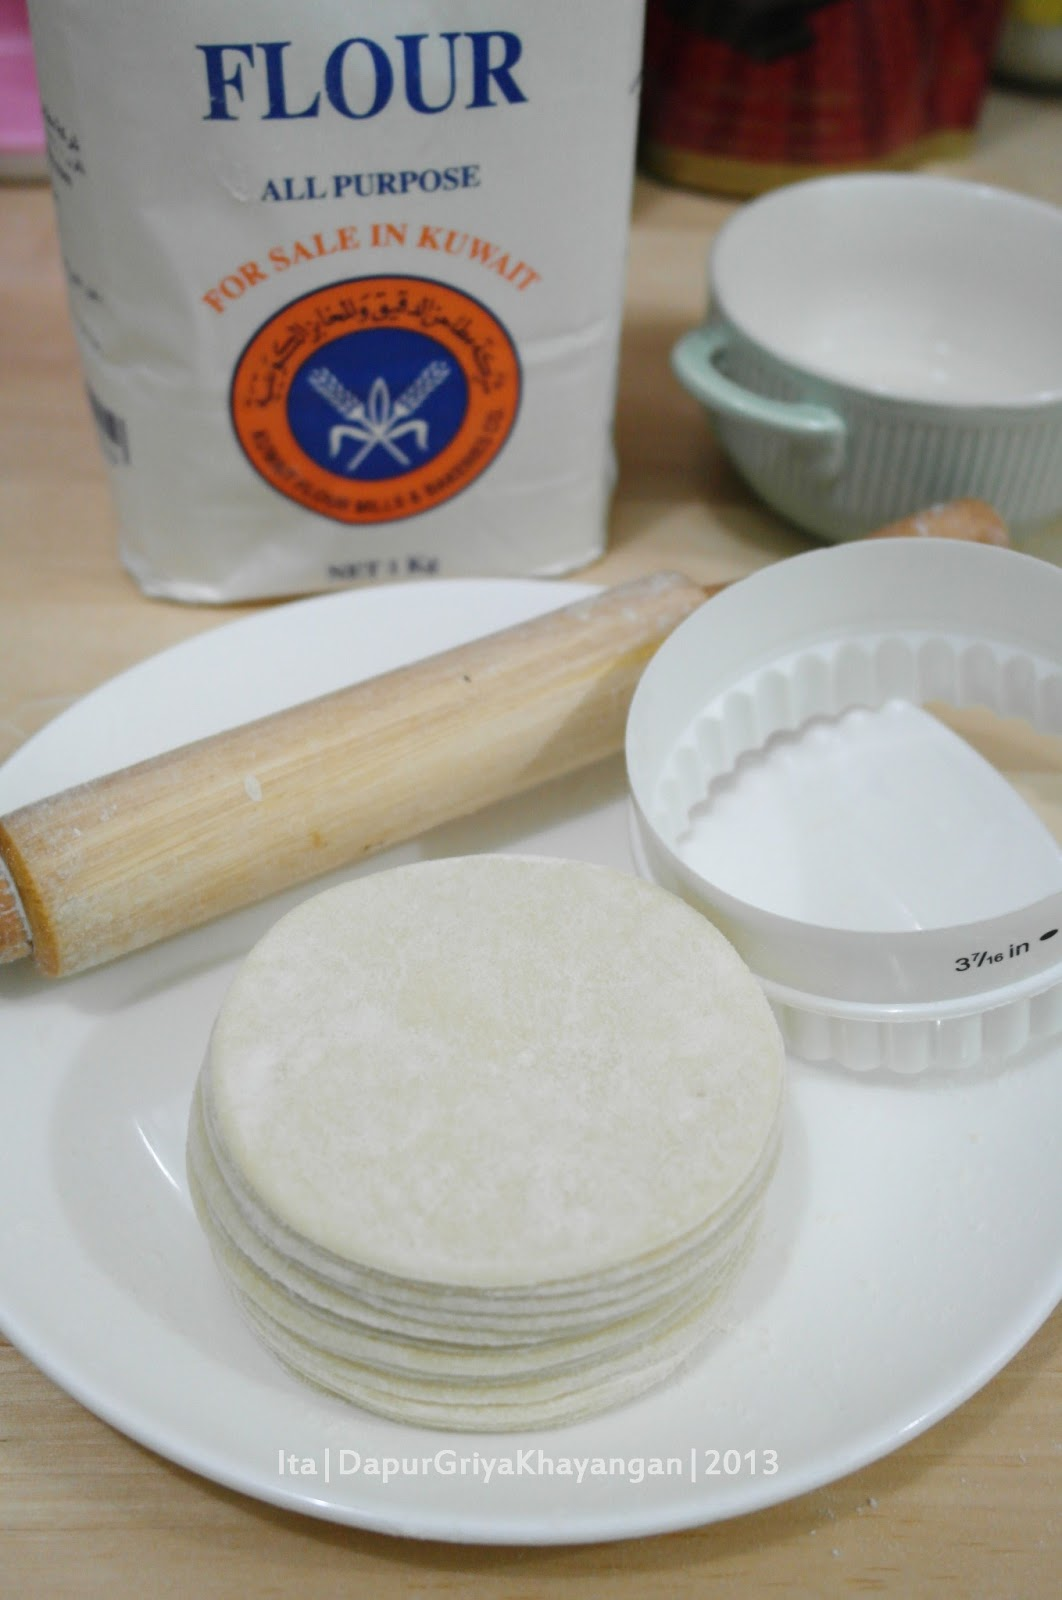 Dapur Griya Khayangan: Membuat Kulit Pangsit Sendiri (Homemade Wonton